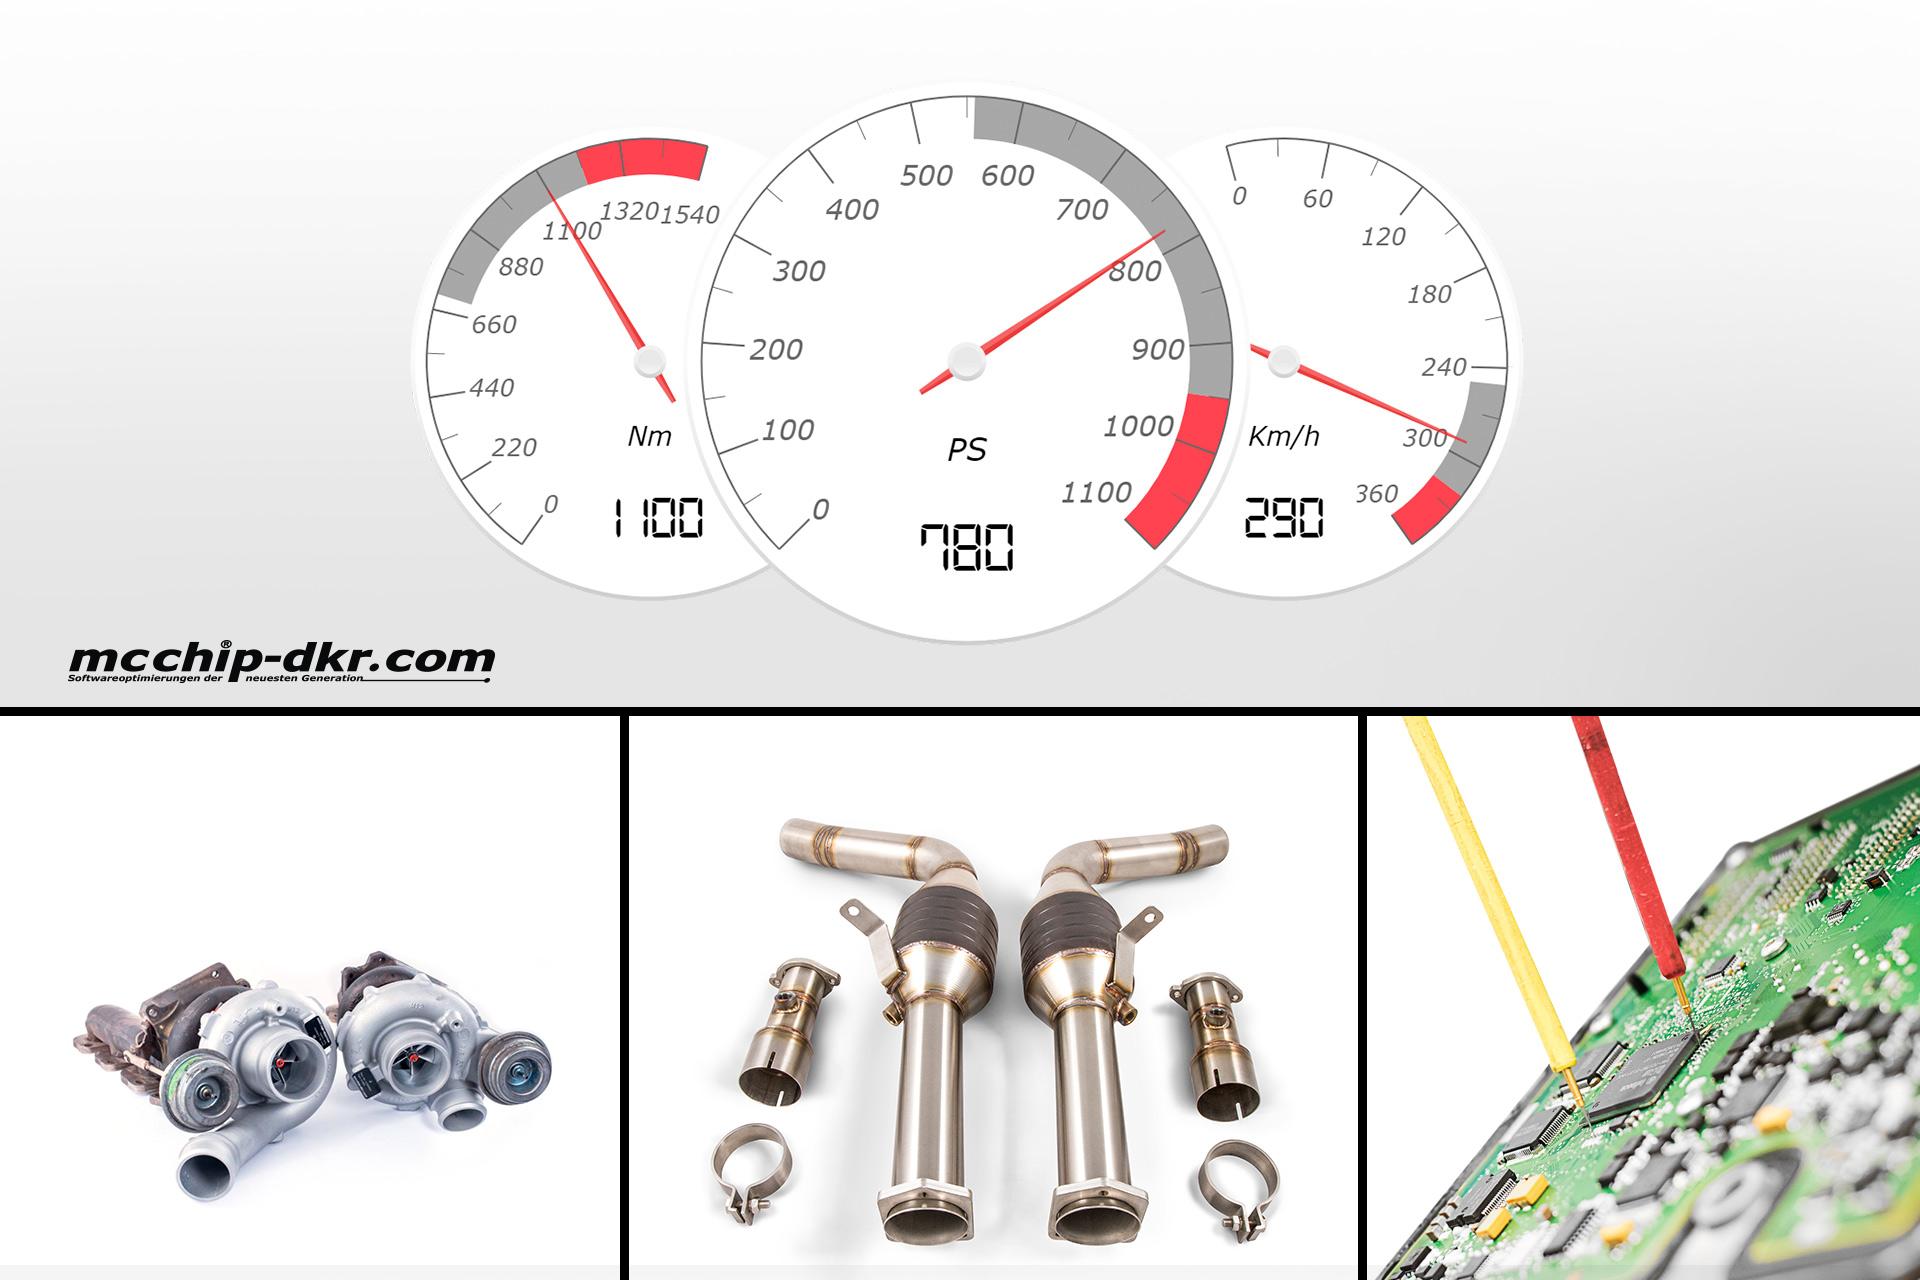 TÜV report - Stage 4 performance upgrade for AMG 63 models